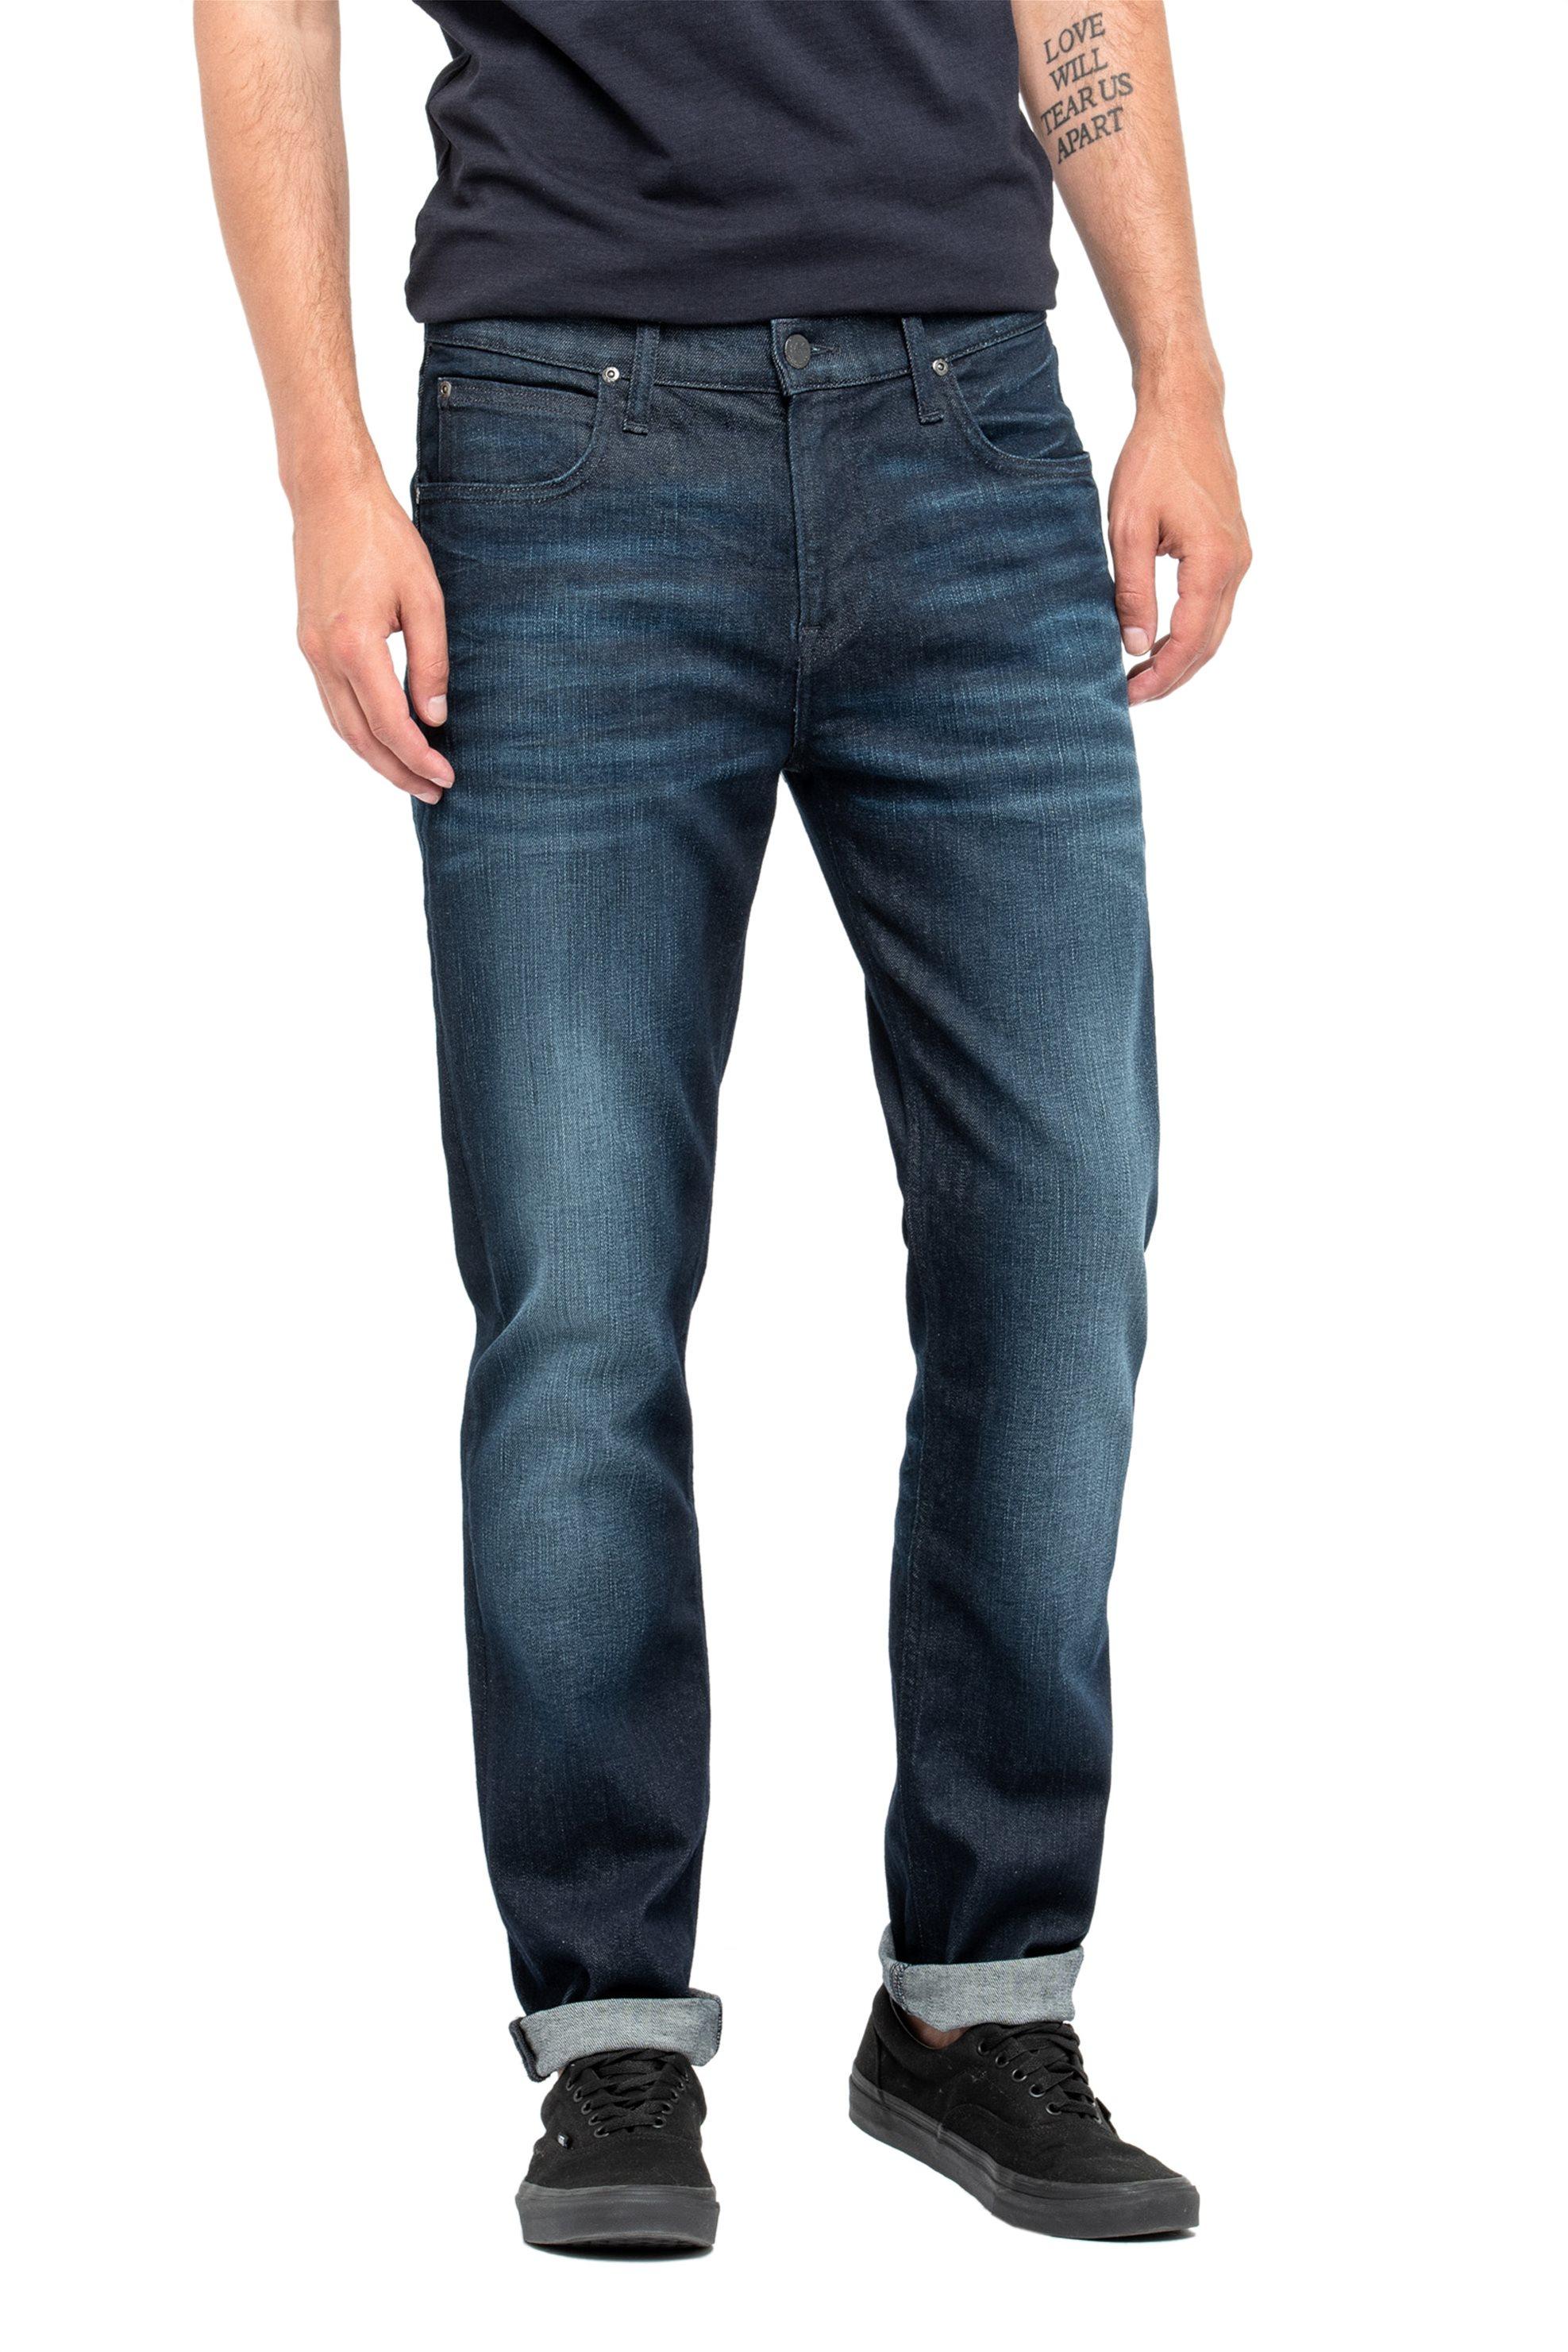 Lee Arvin regular tapered ανδρικό τζην παντελόνι Shrewd Blue - L732KIRQ - Μπλε Σ ανδρασ   ρουχα   jeans   tapered